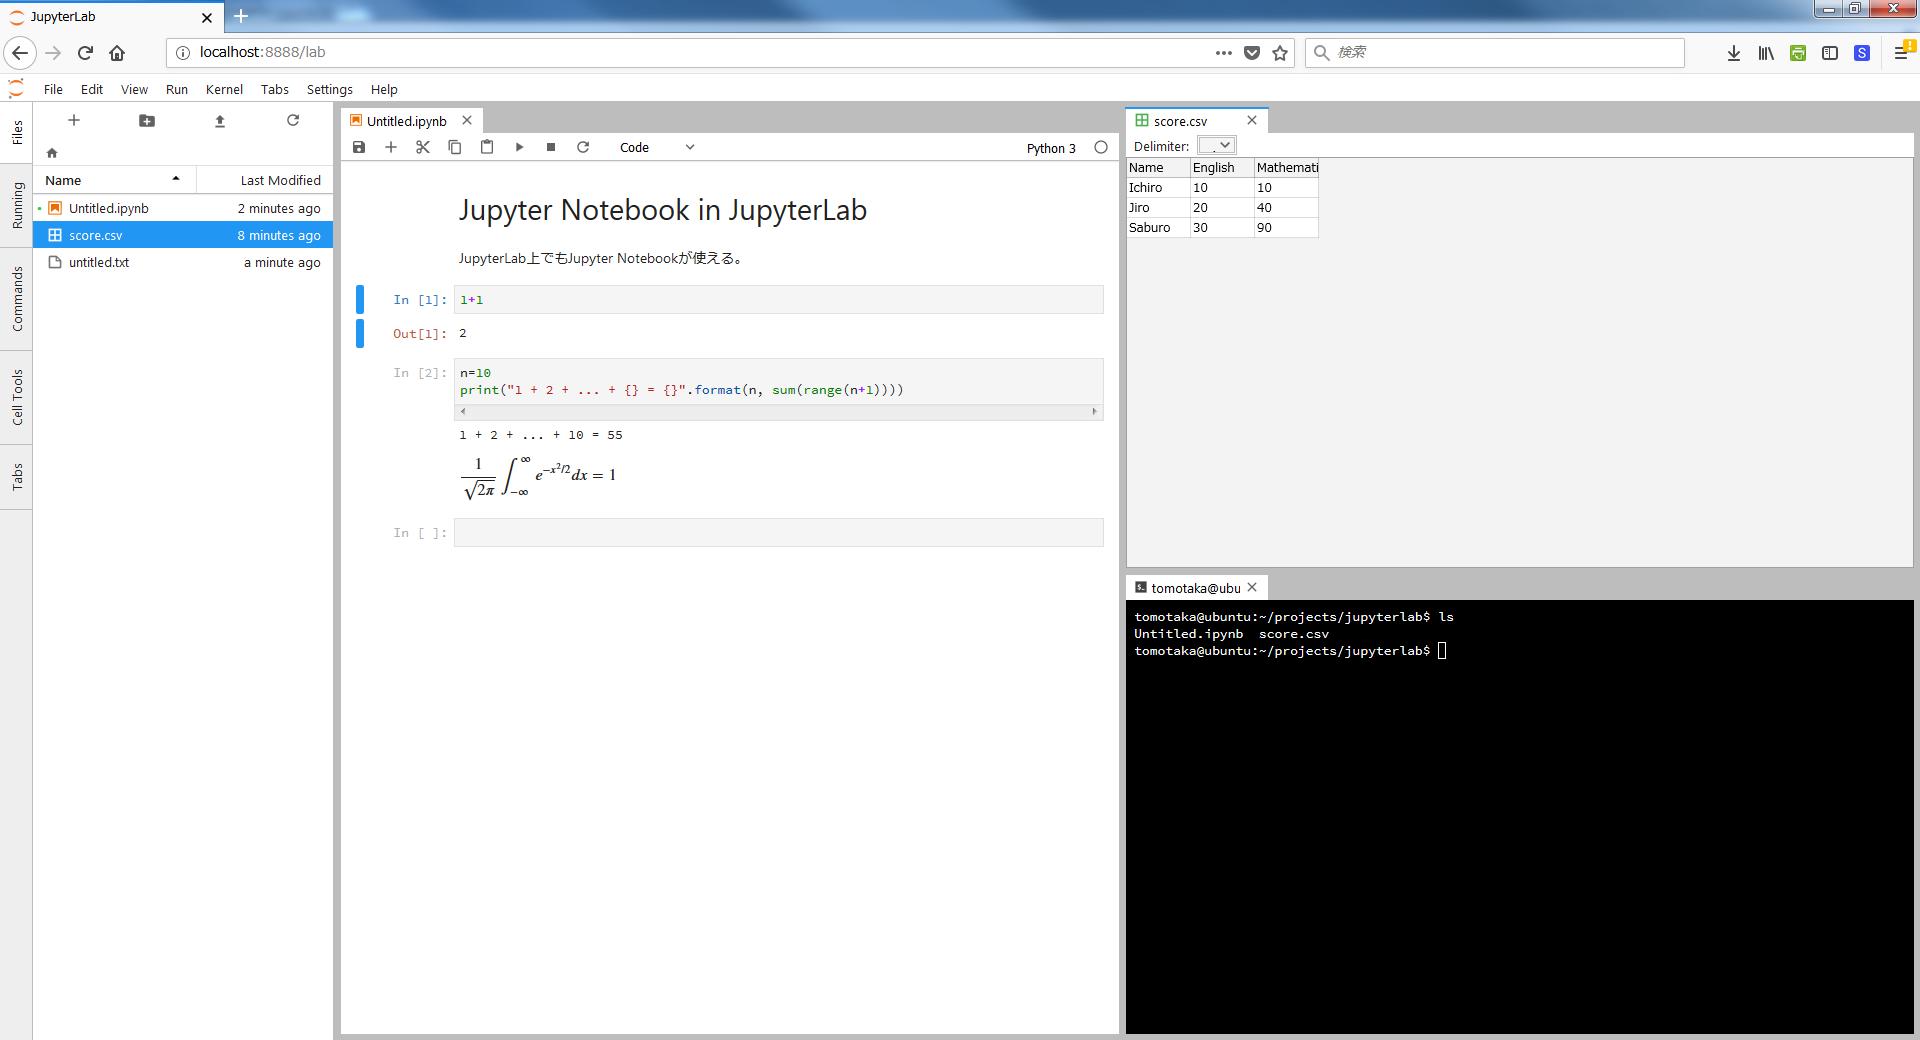 JupyterLabの画面